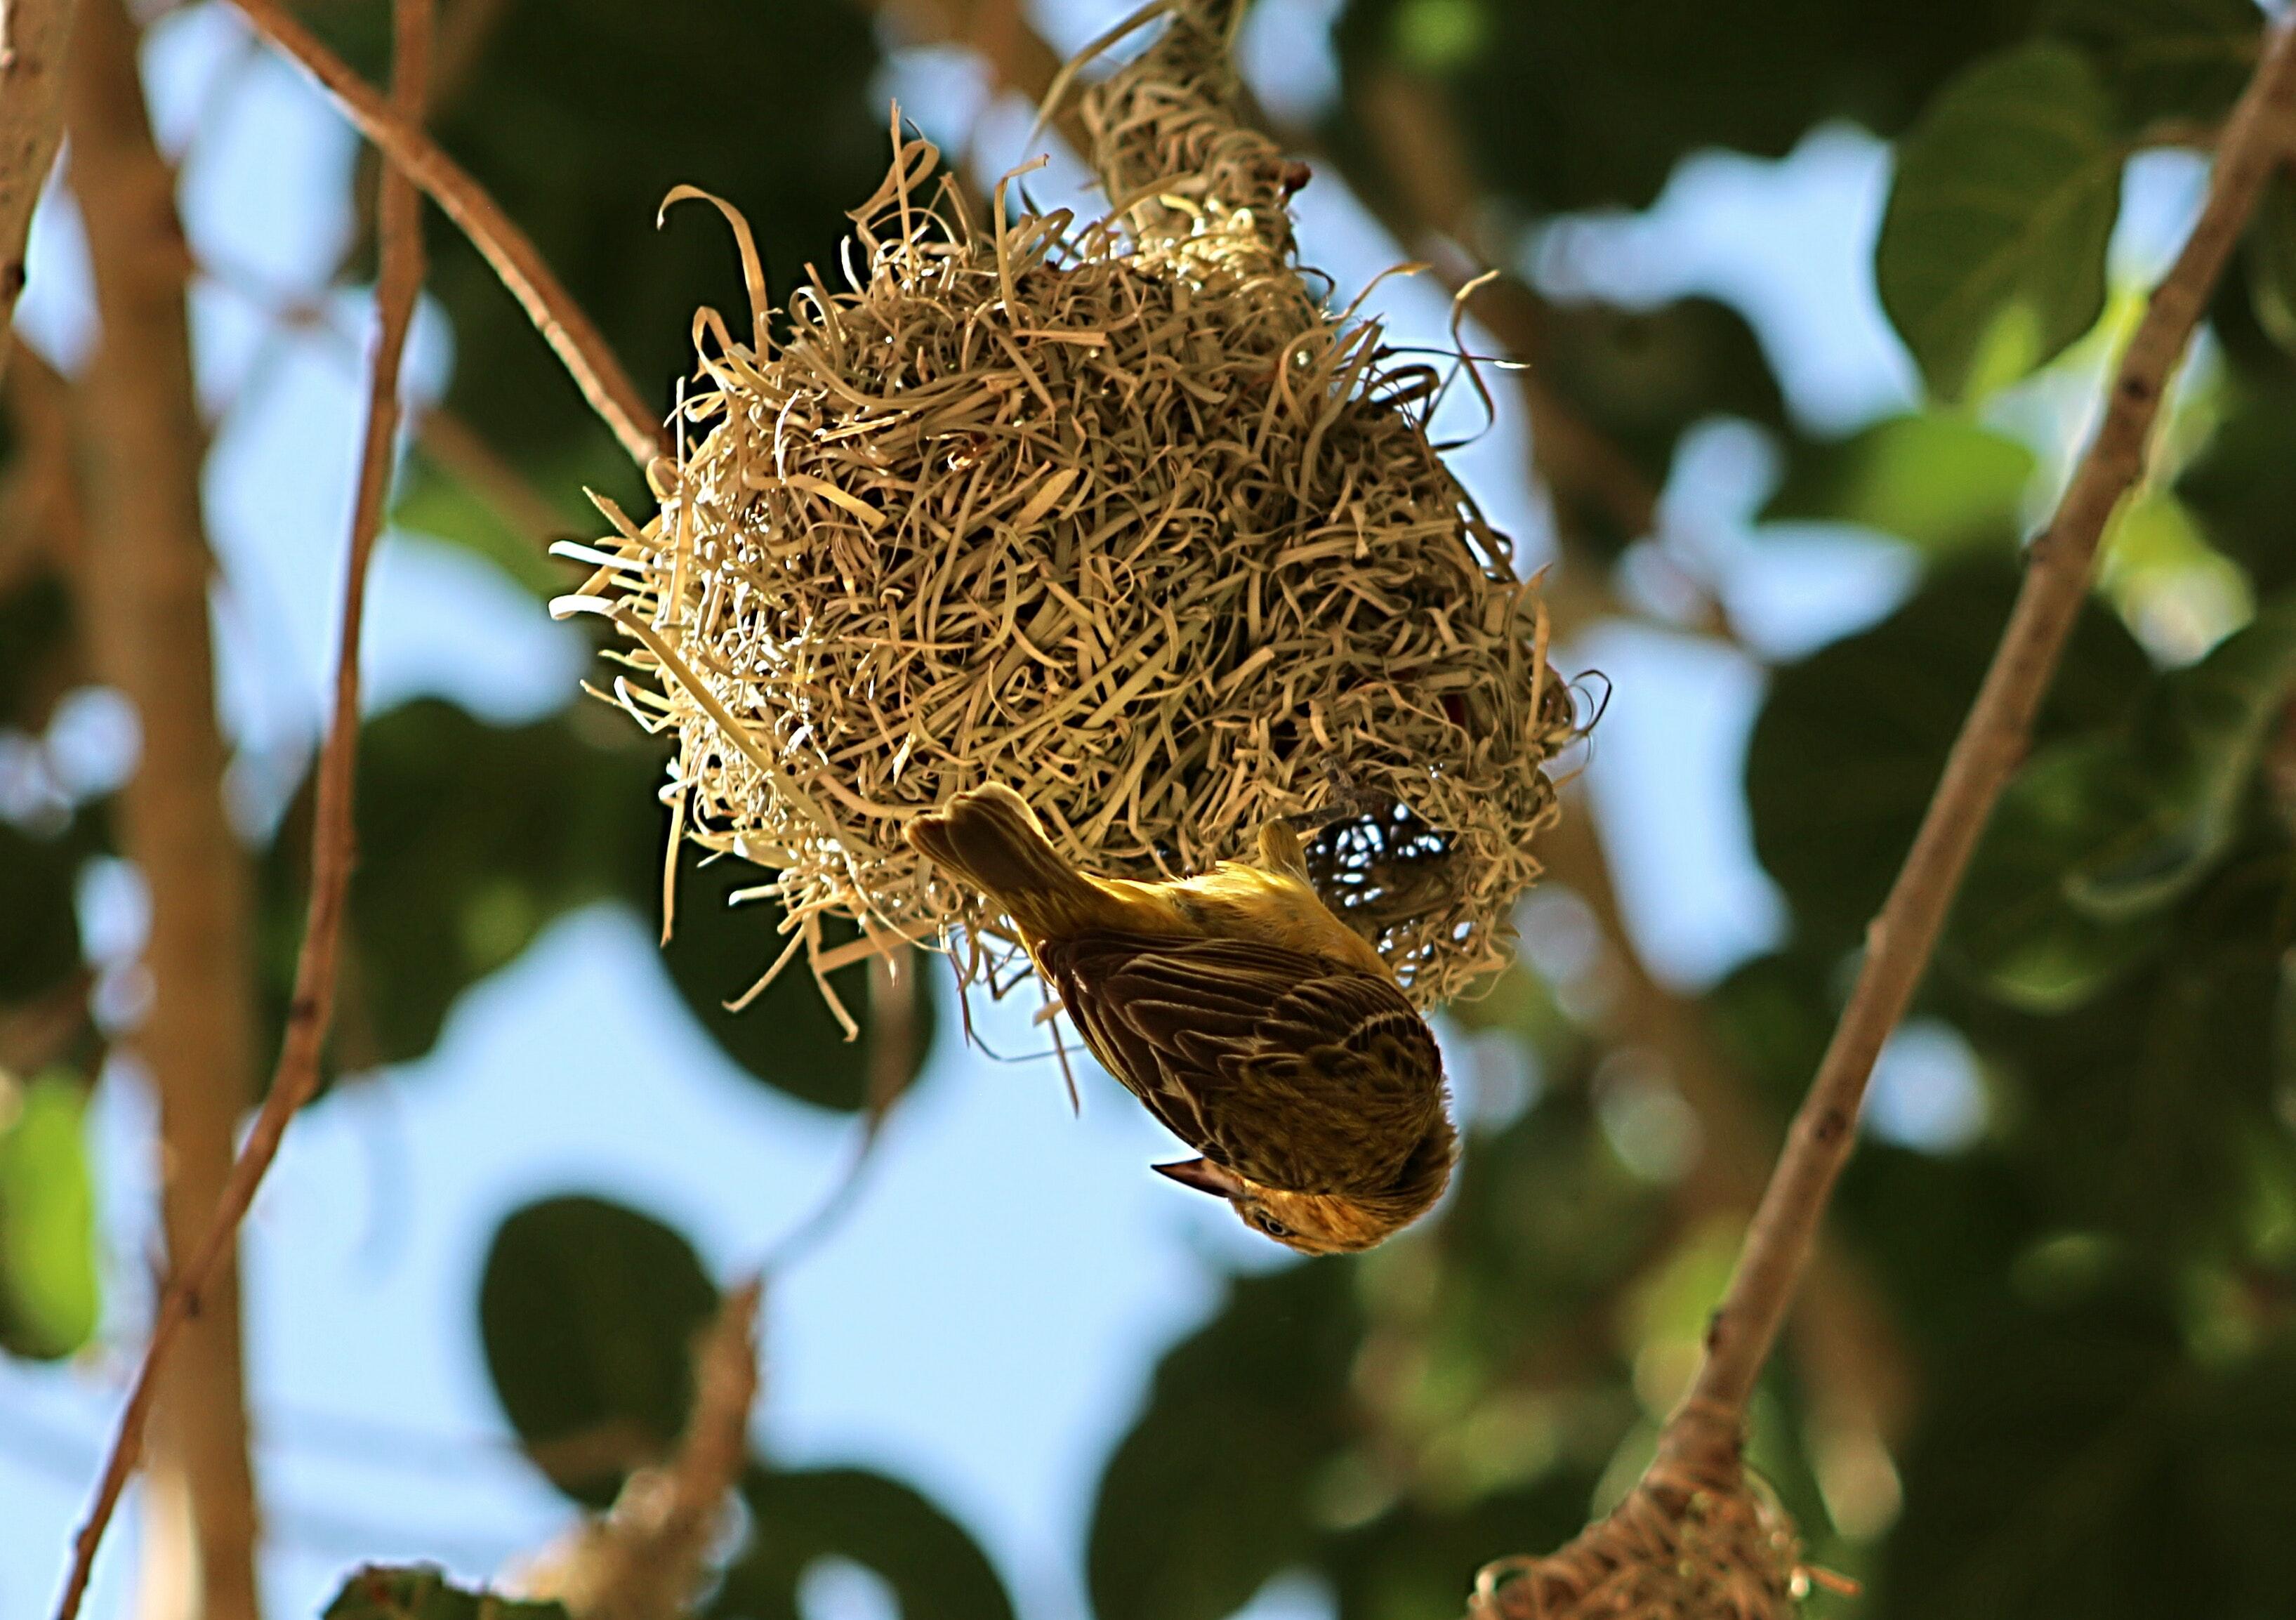 Картинка птица в гнезде на дереве